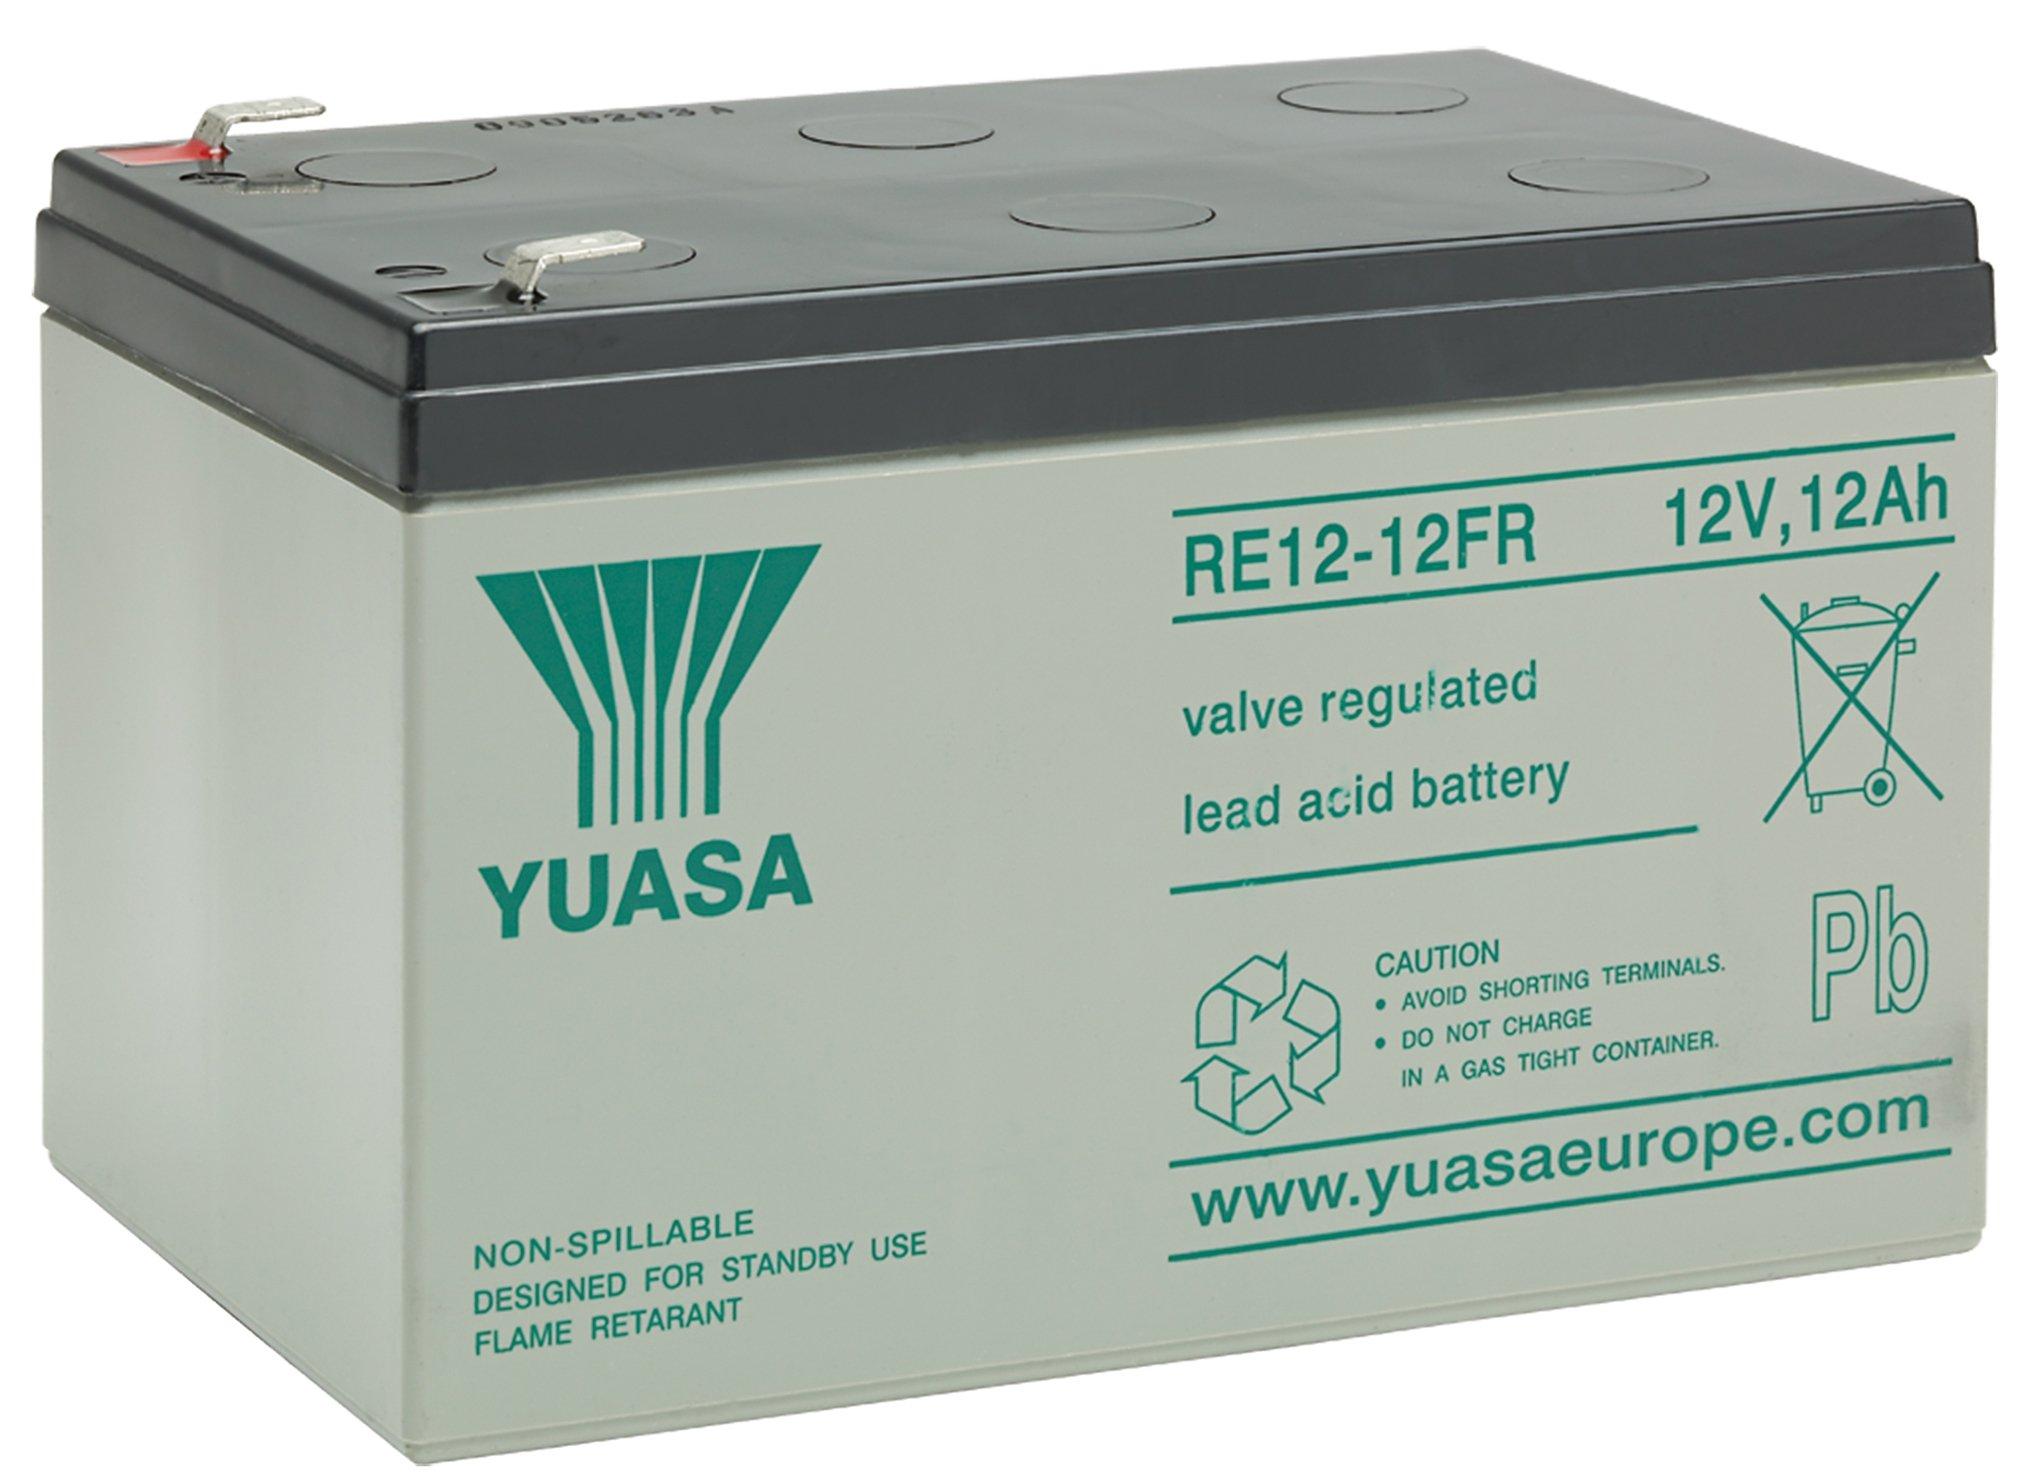 12V/12Ah Yuasa Blybatteri RE12-12